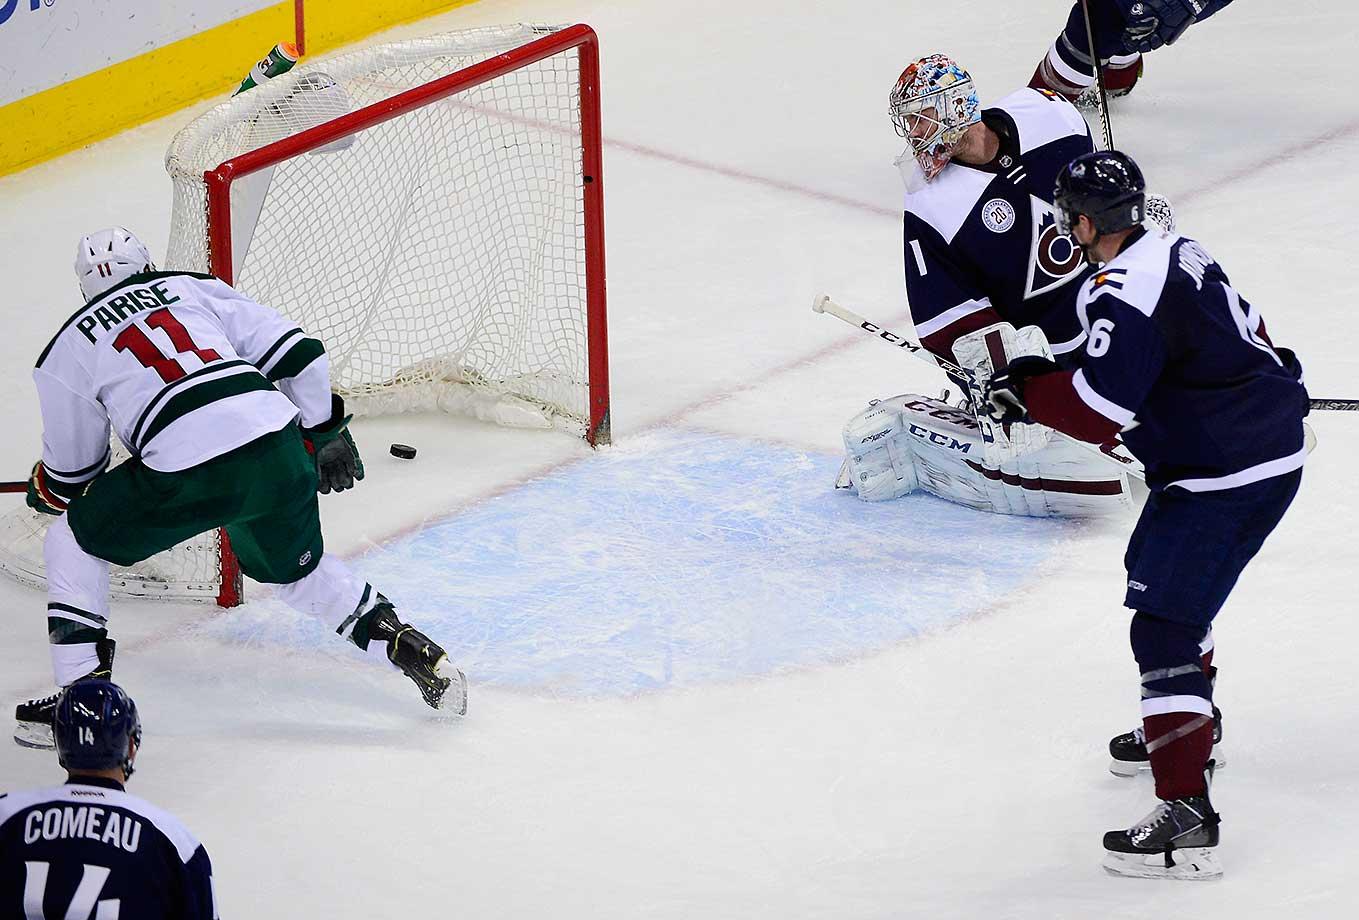 Colorado goalie Semyon Varlamov looks back after Minnesota's Zach Parise scores.